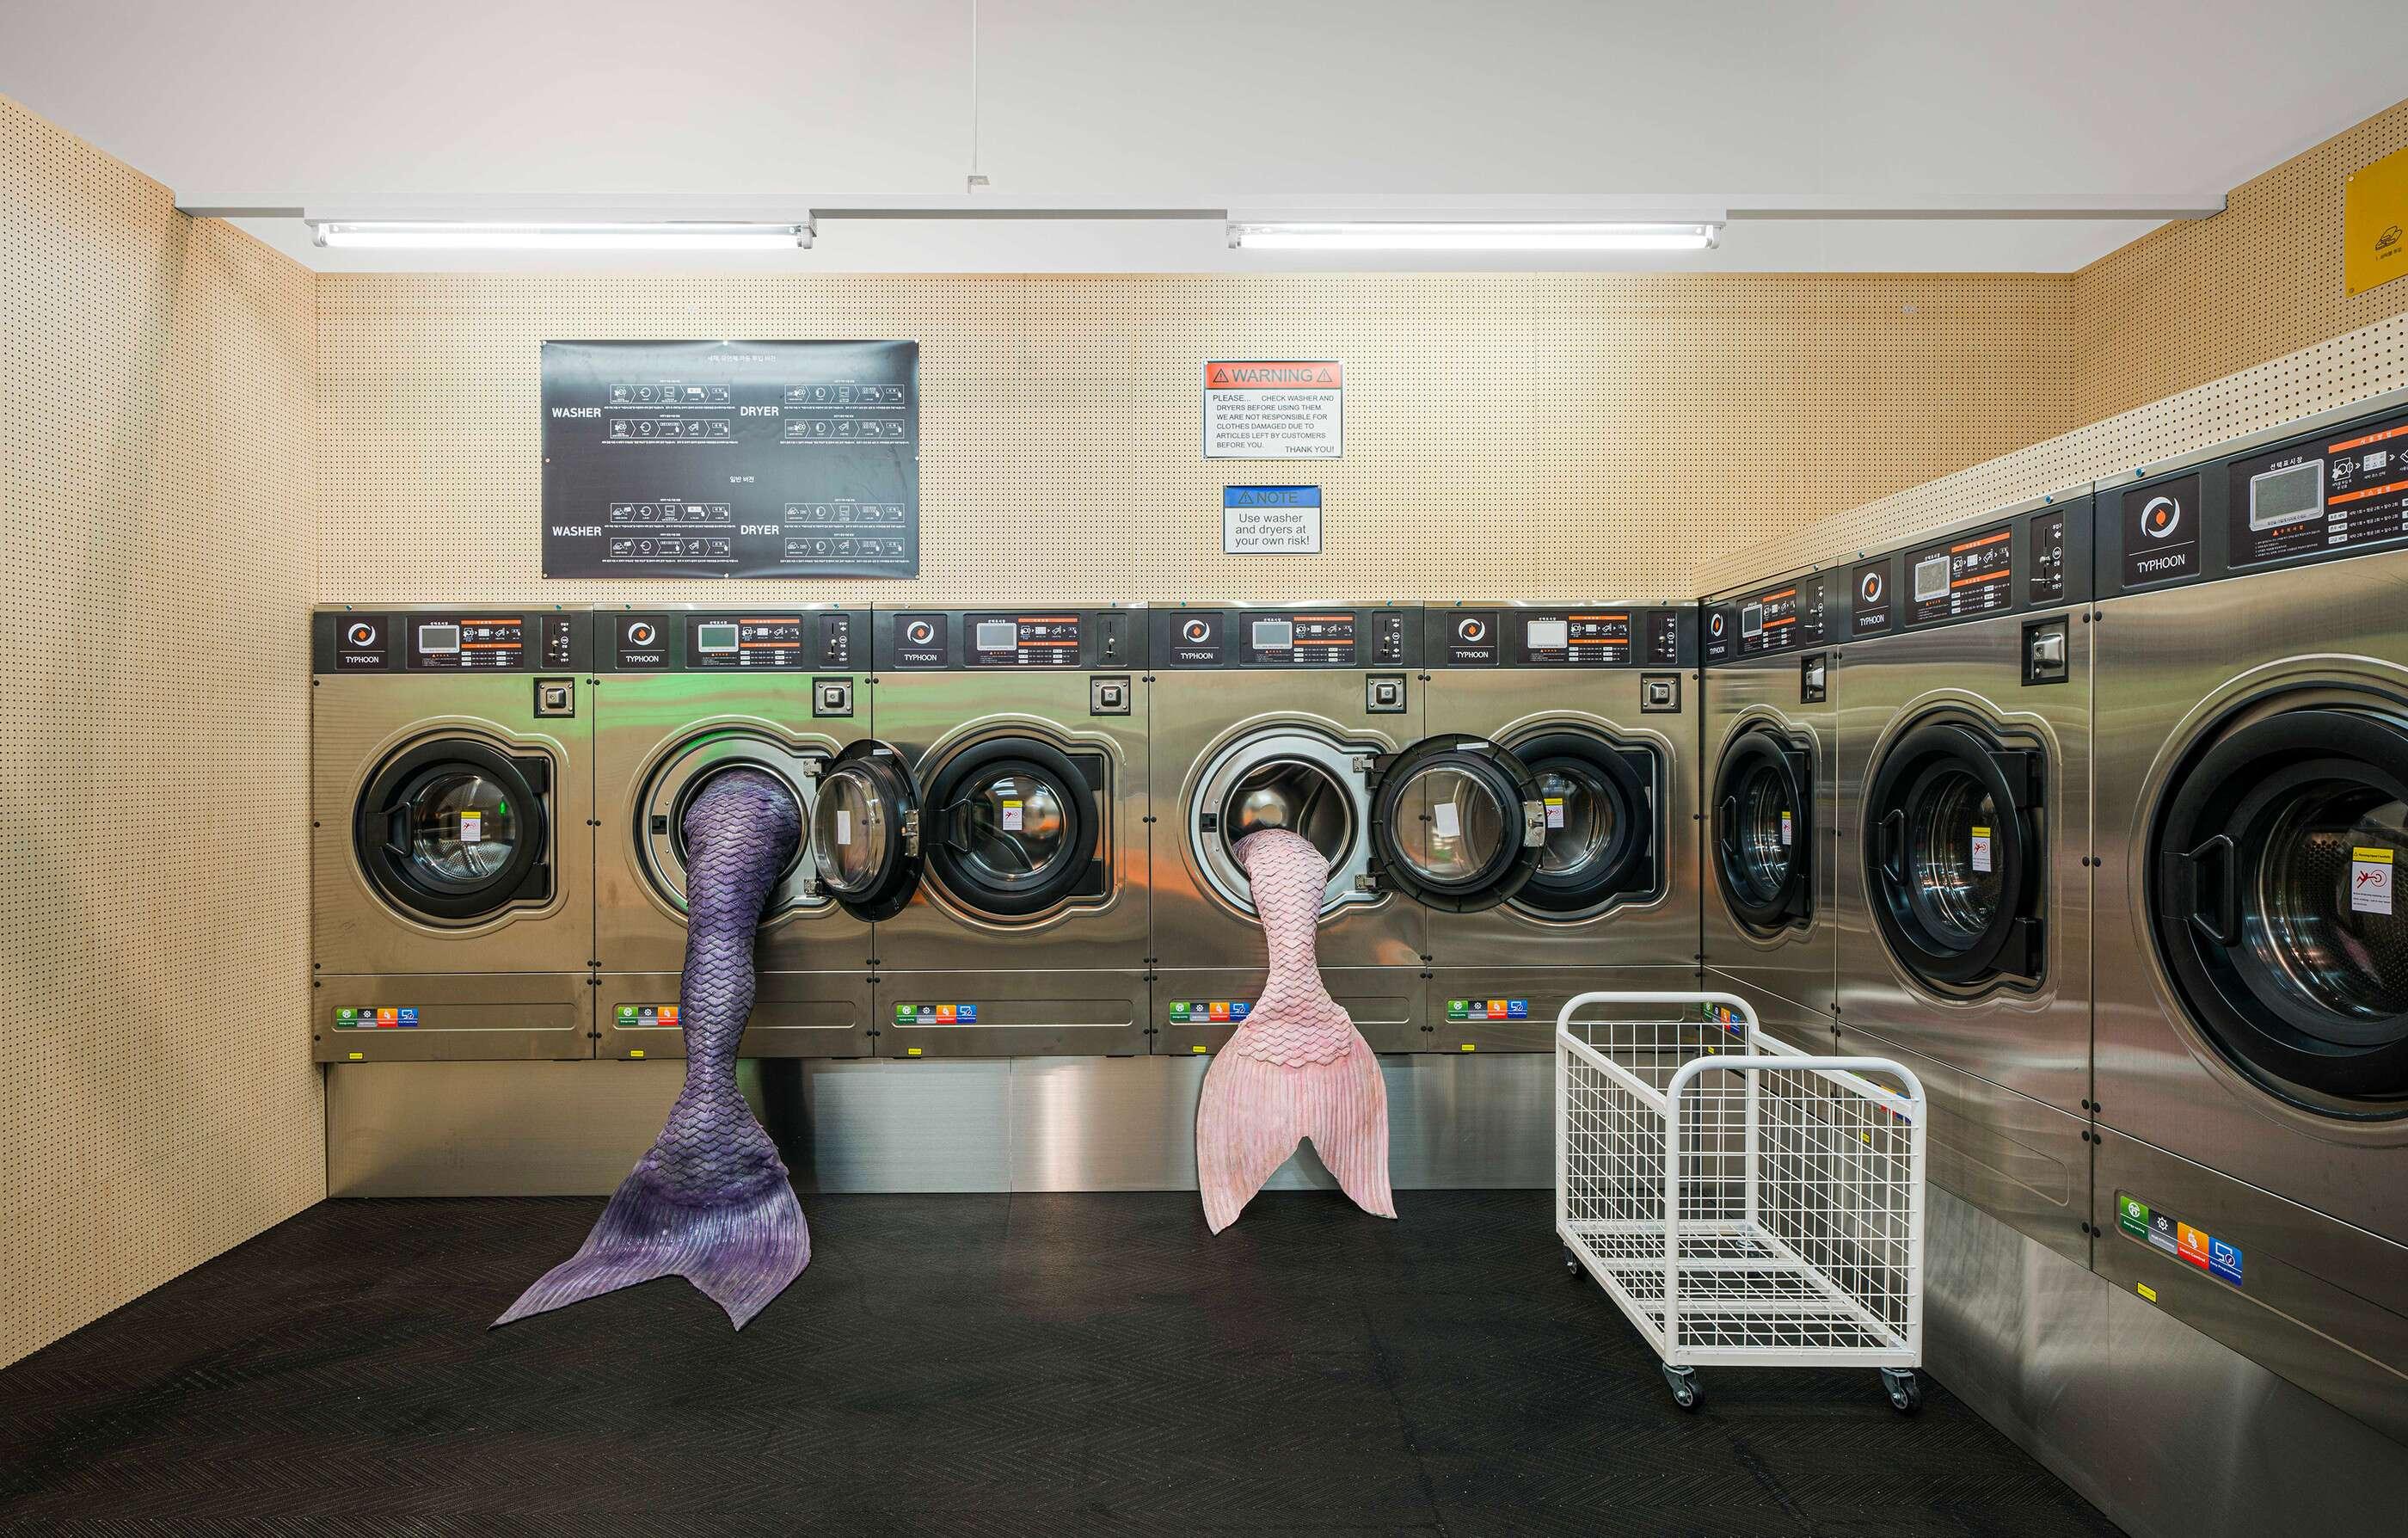 Olivia-Erlanger-Ida-Ida-Ida-2020-Gucci-Exhibition-No-Space-Just-a-Place-Daelim-Museum-Seoul-2020-01